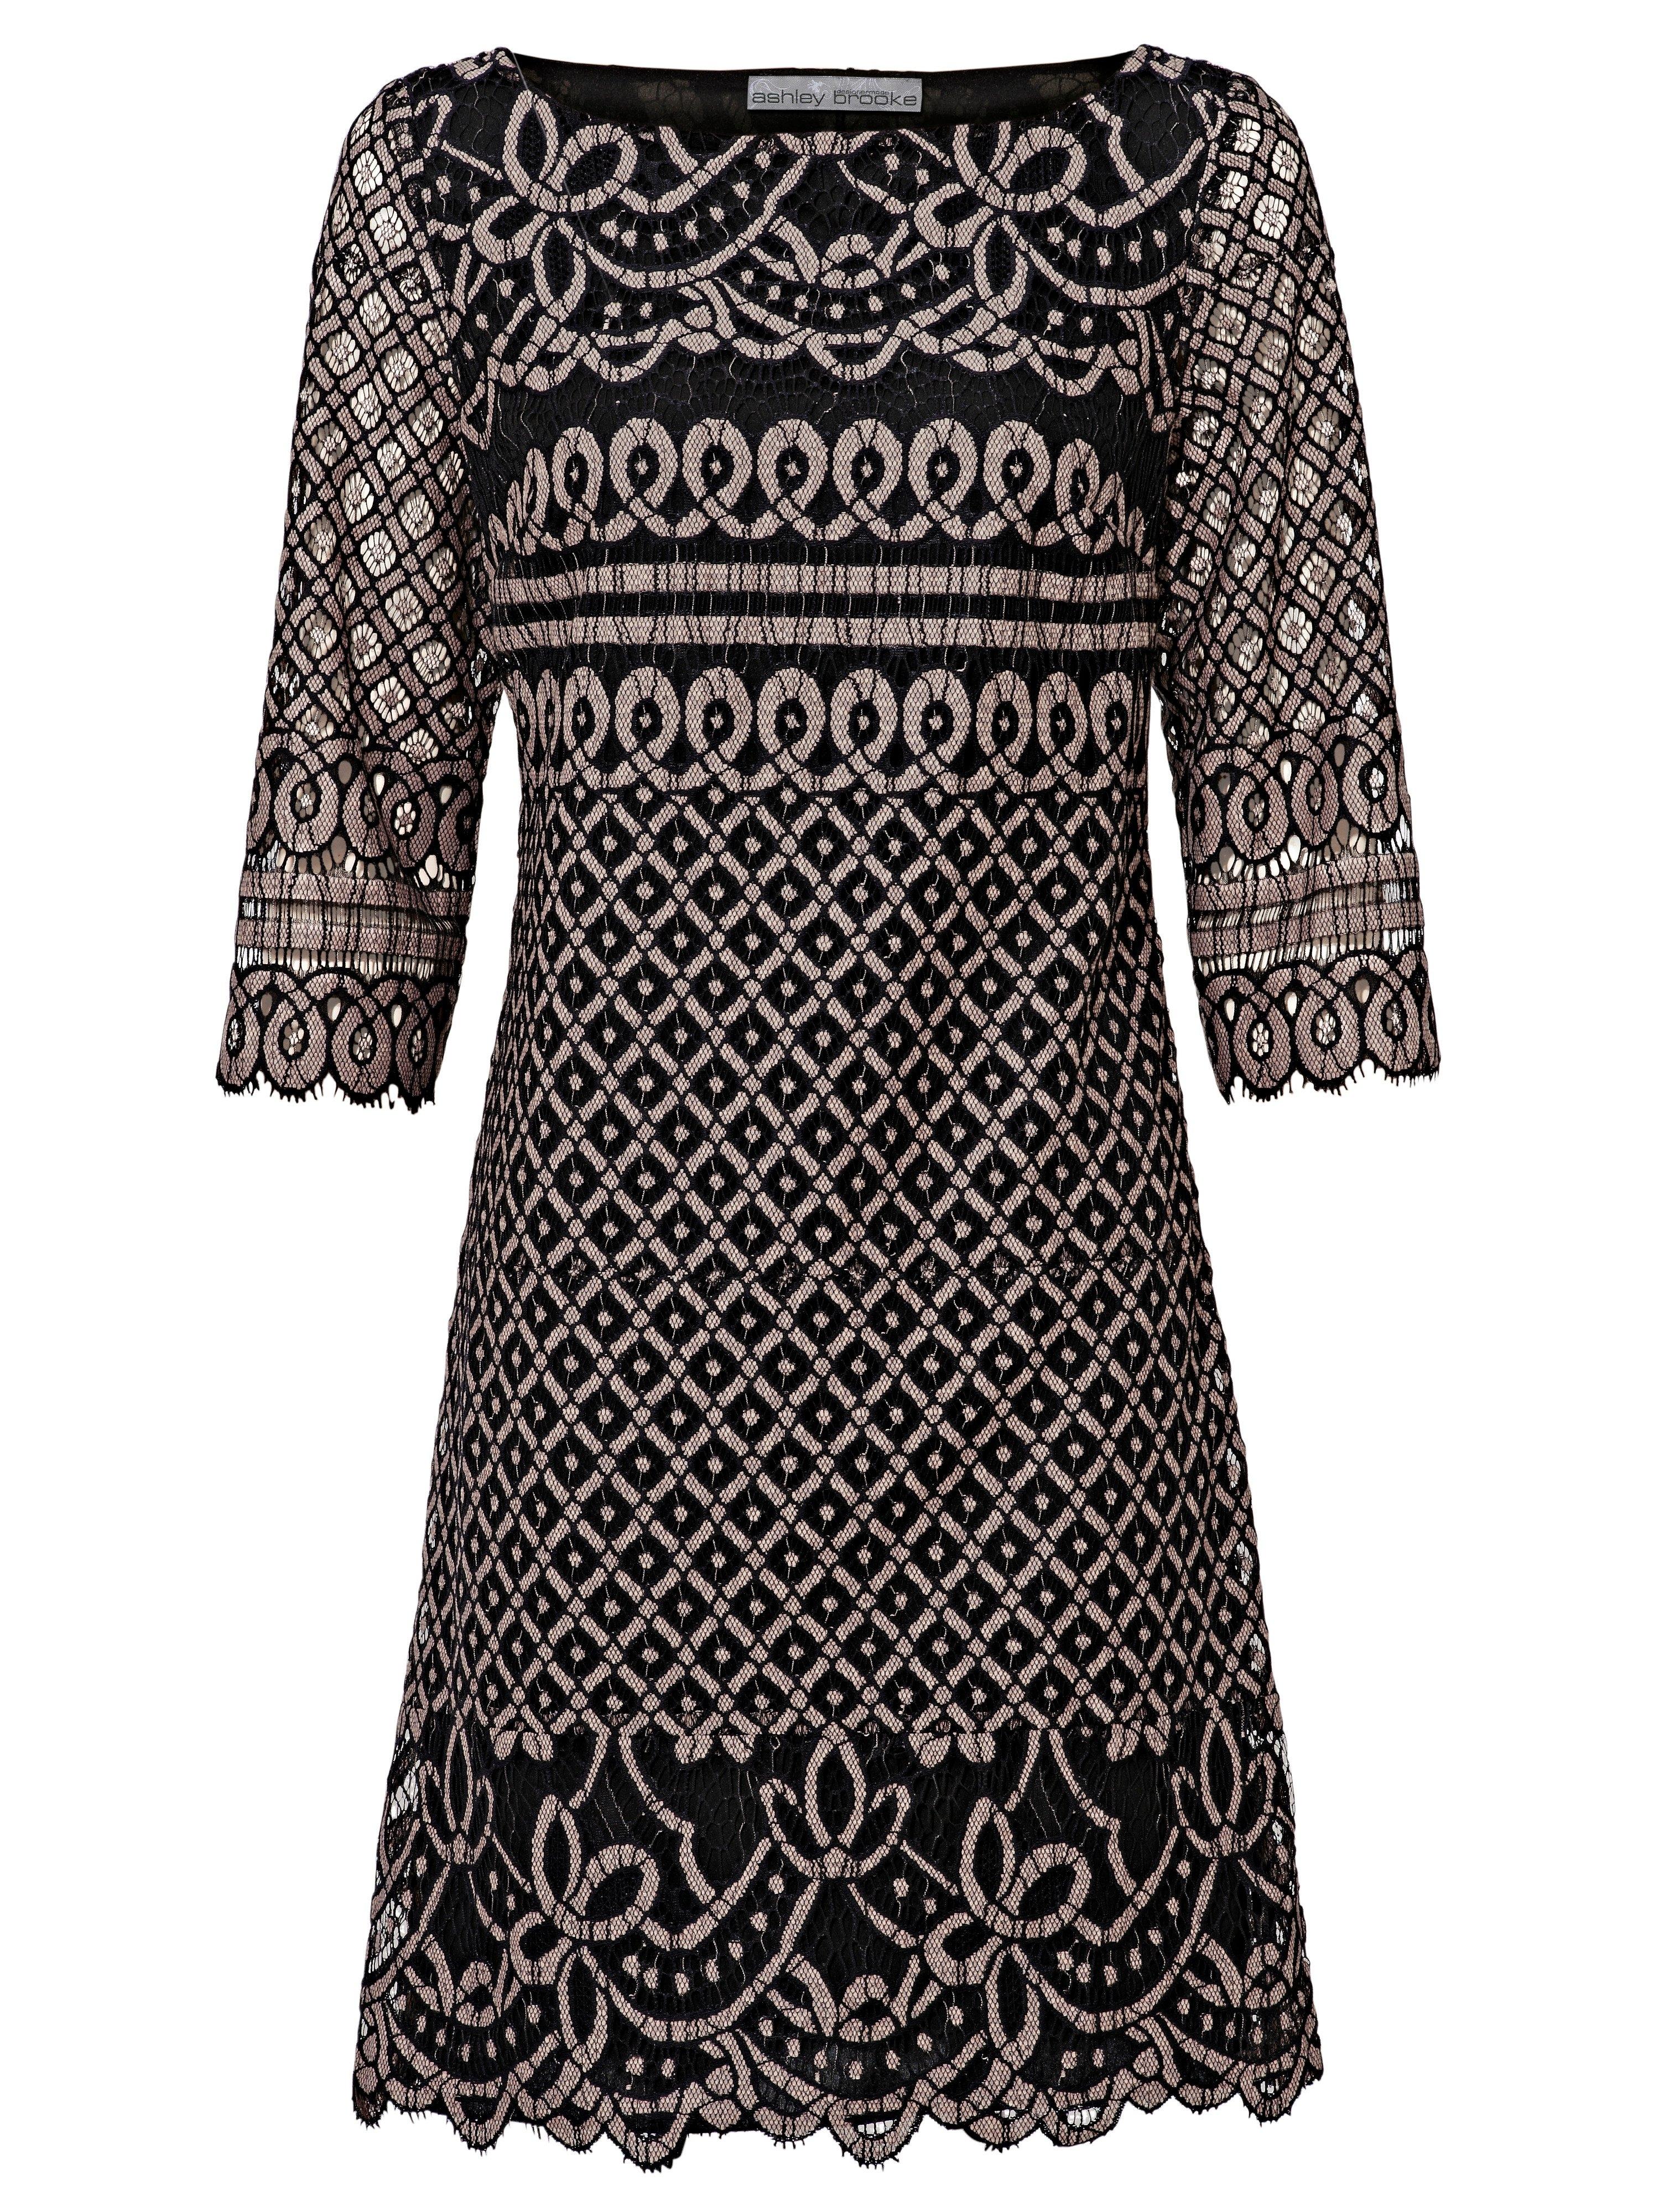 Patrizia Dini By Heine Kanten jurk bestellen: 14 dagen bedenktijd